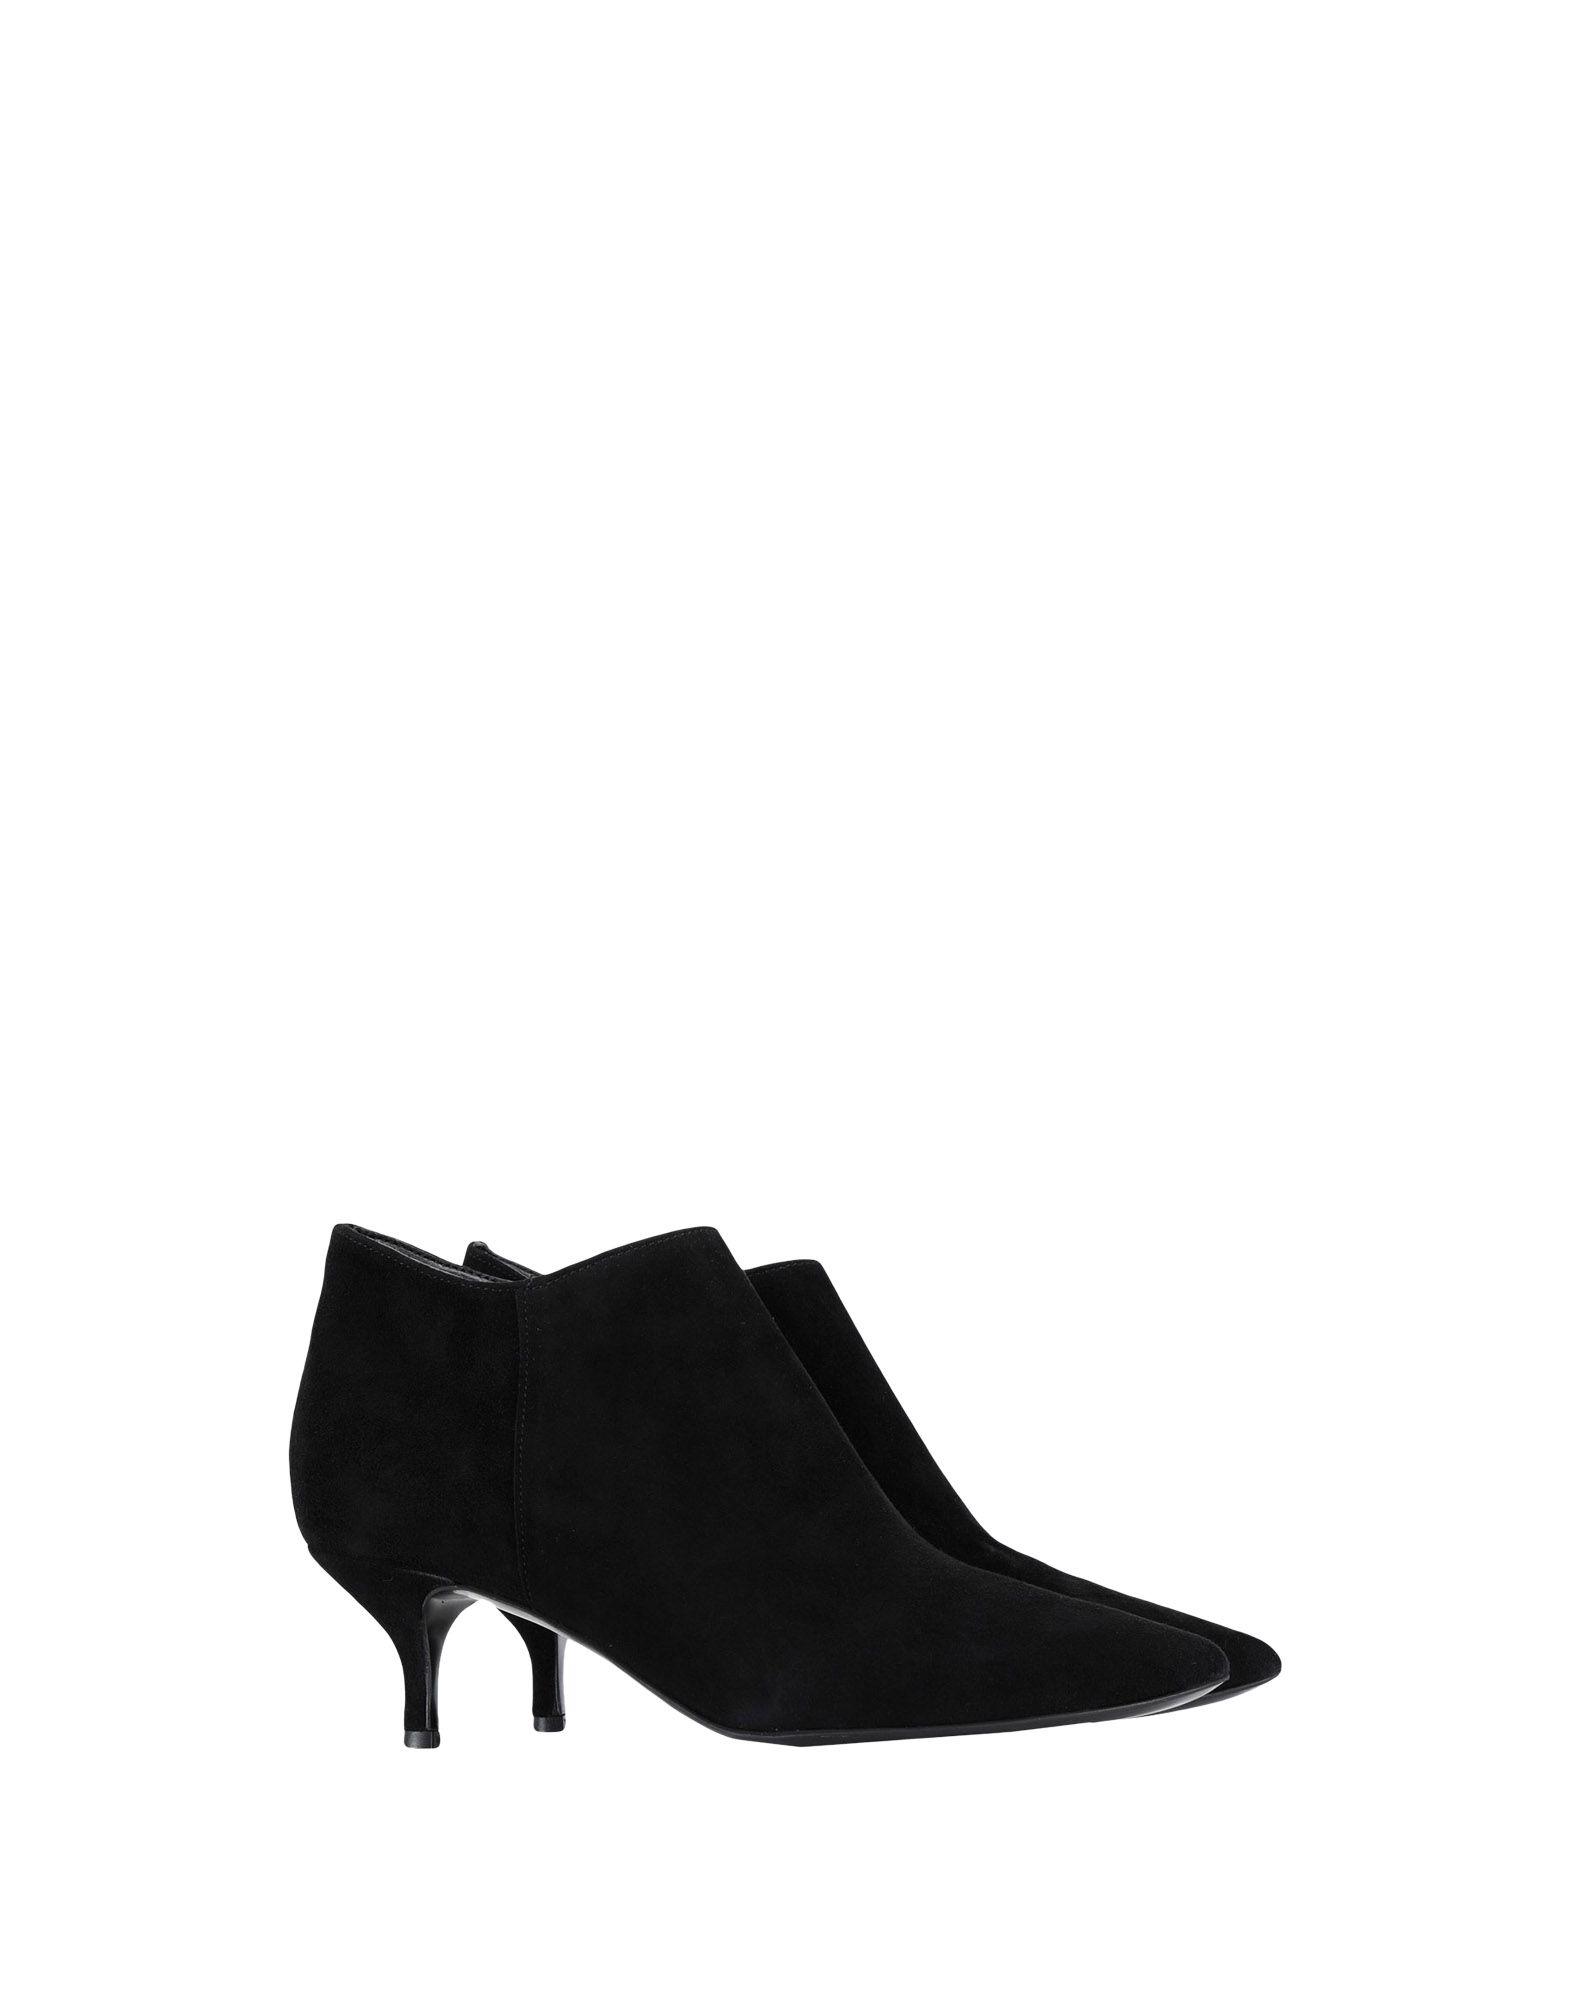 Stilvolle billige Schuhe Prima Edizione Stiefelette Damen  11538239PA 11538239PA 11538239PA 4b6d83